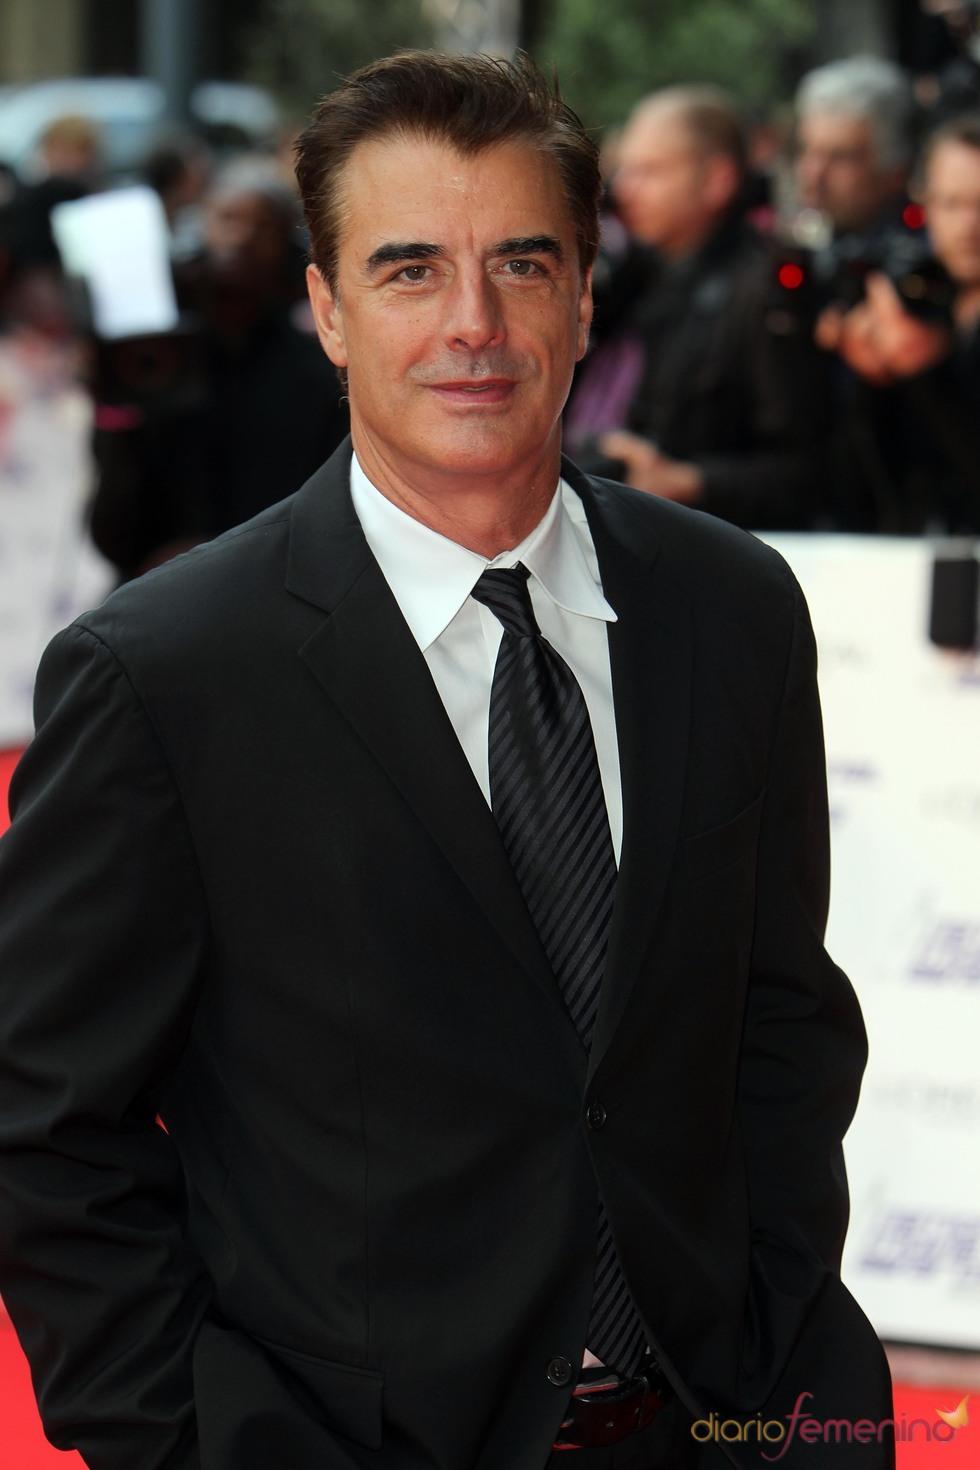 Chris Noth en los National Movies Awards 2010